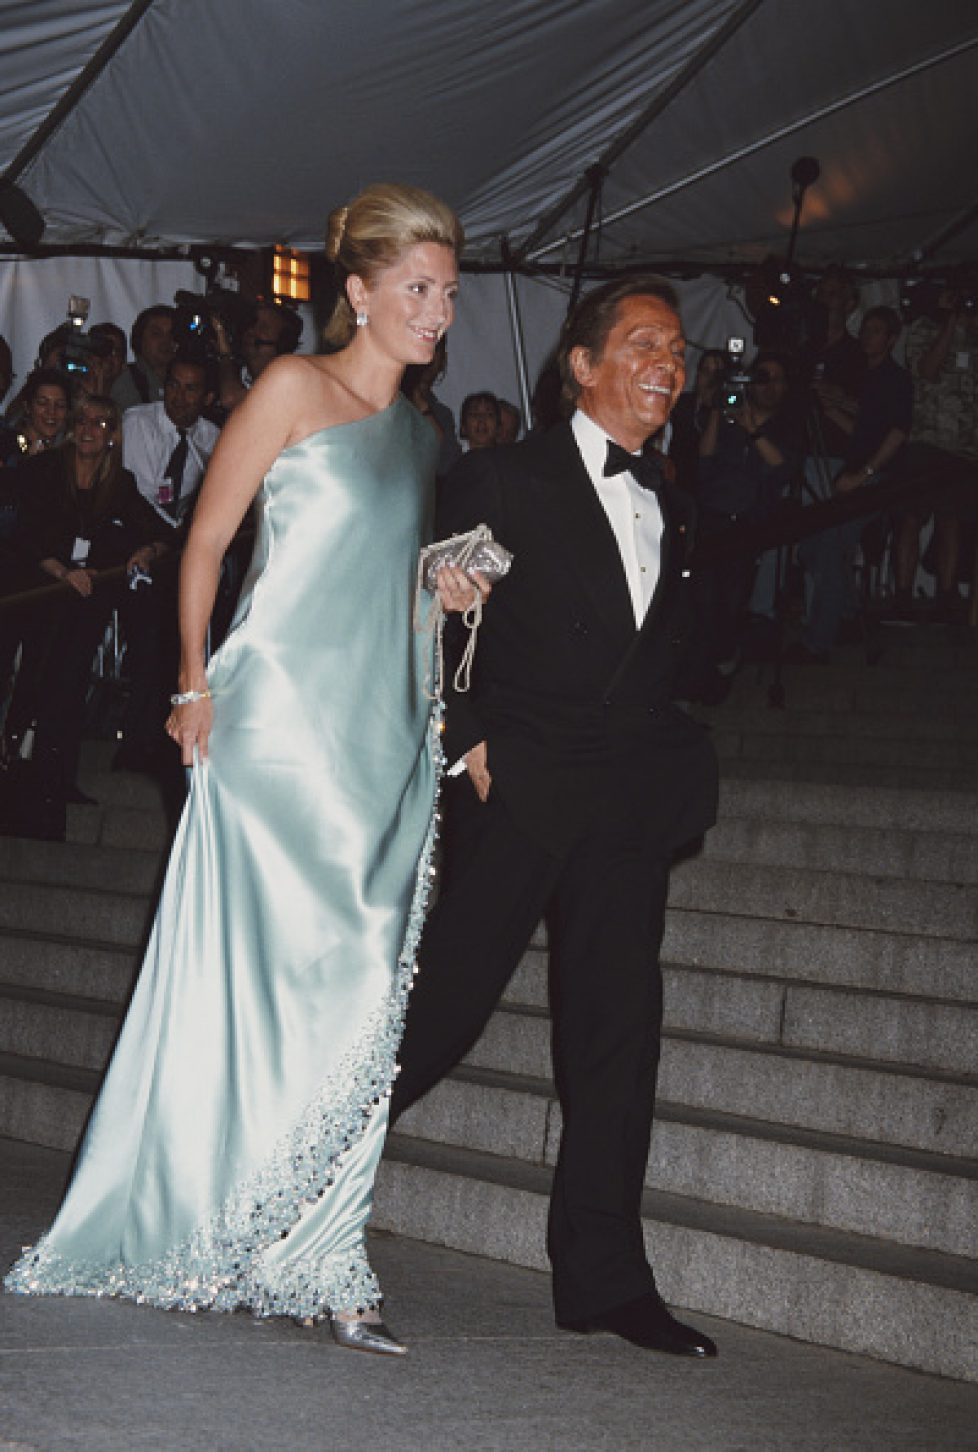 Valentino Garavani and Princess Marie-Chantal of Greece